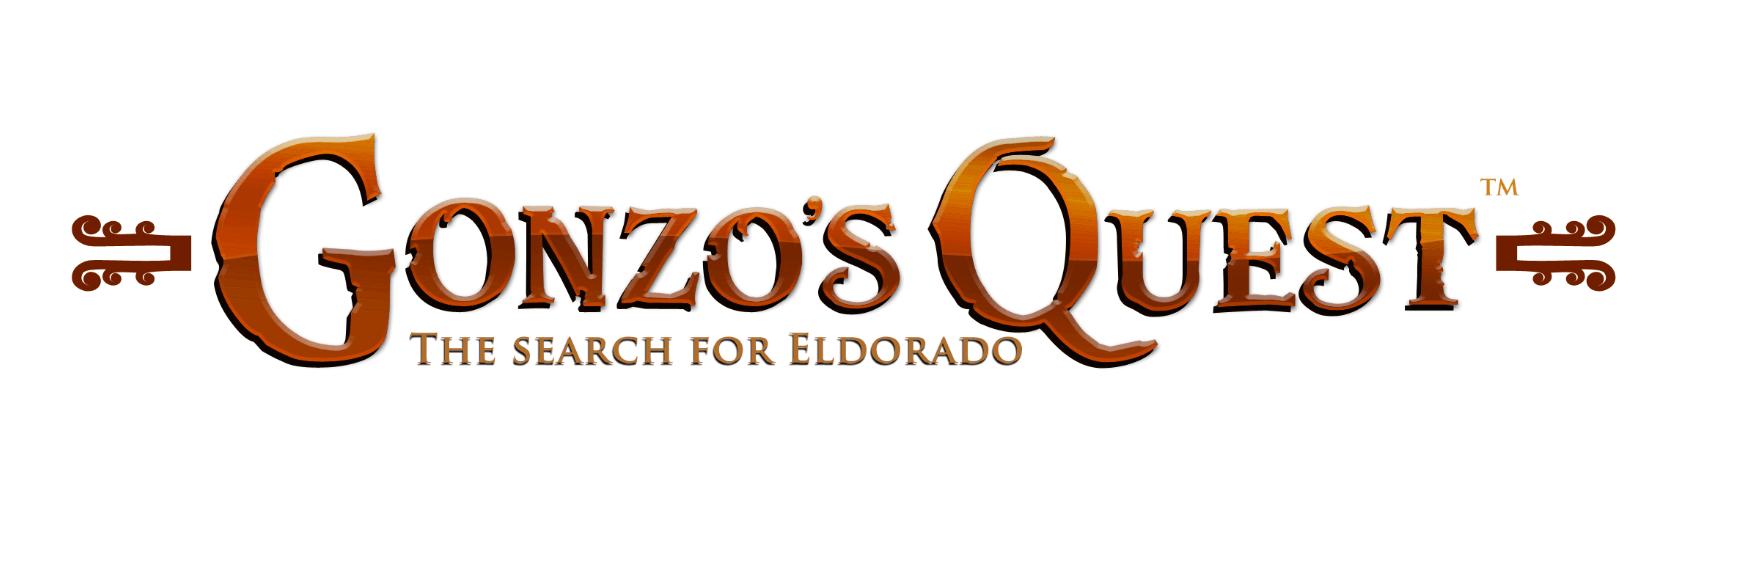 GonzosQuest-monday-Expekt